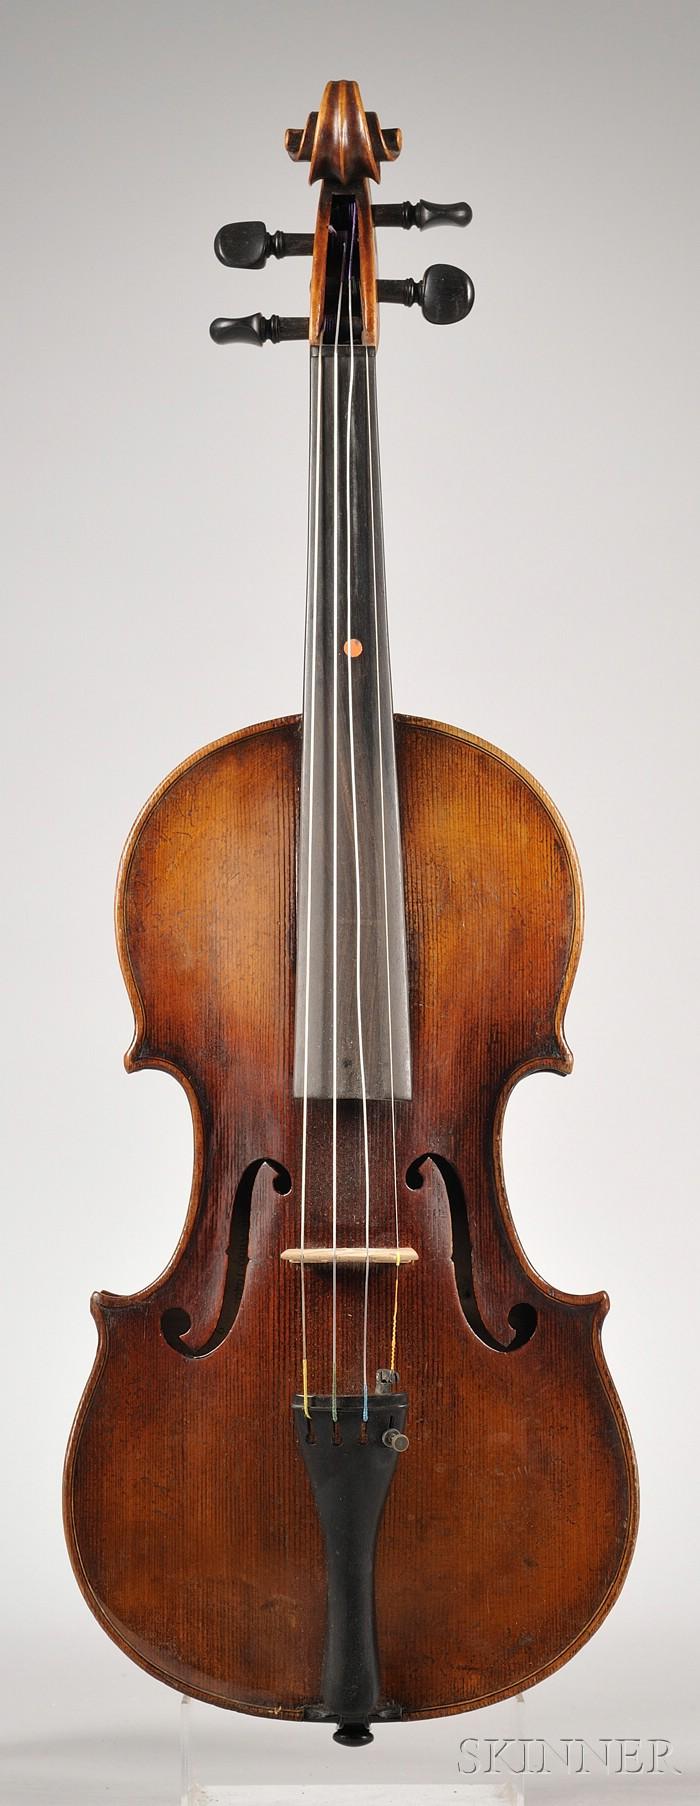 German Violin, c. 1900